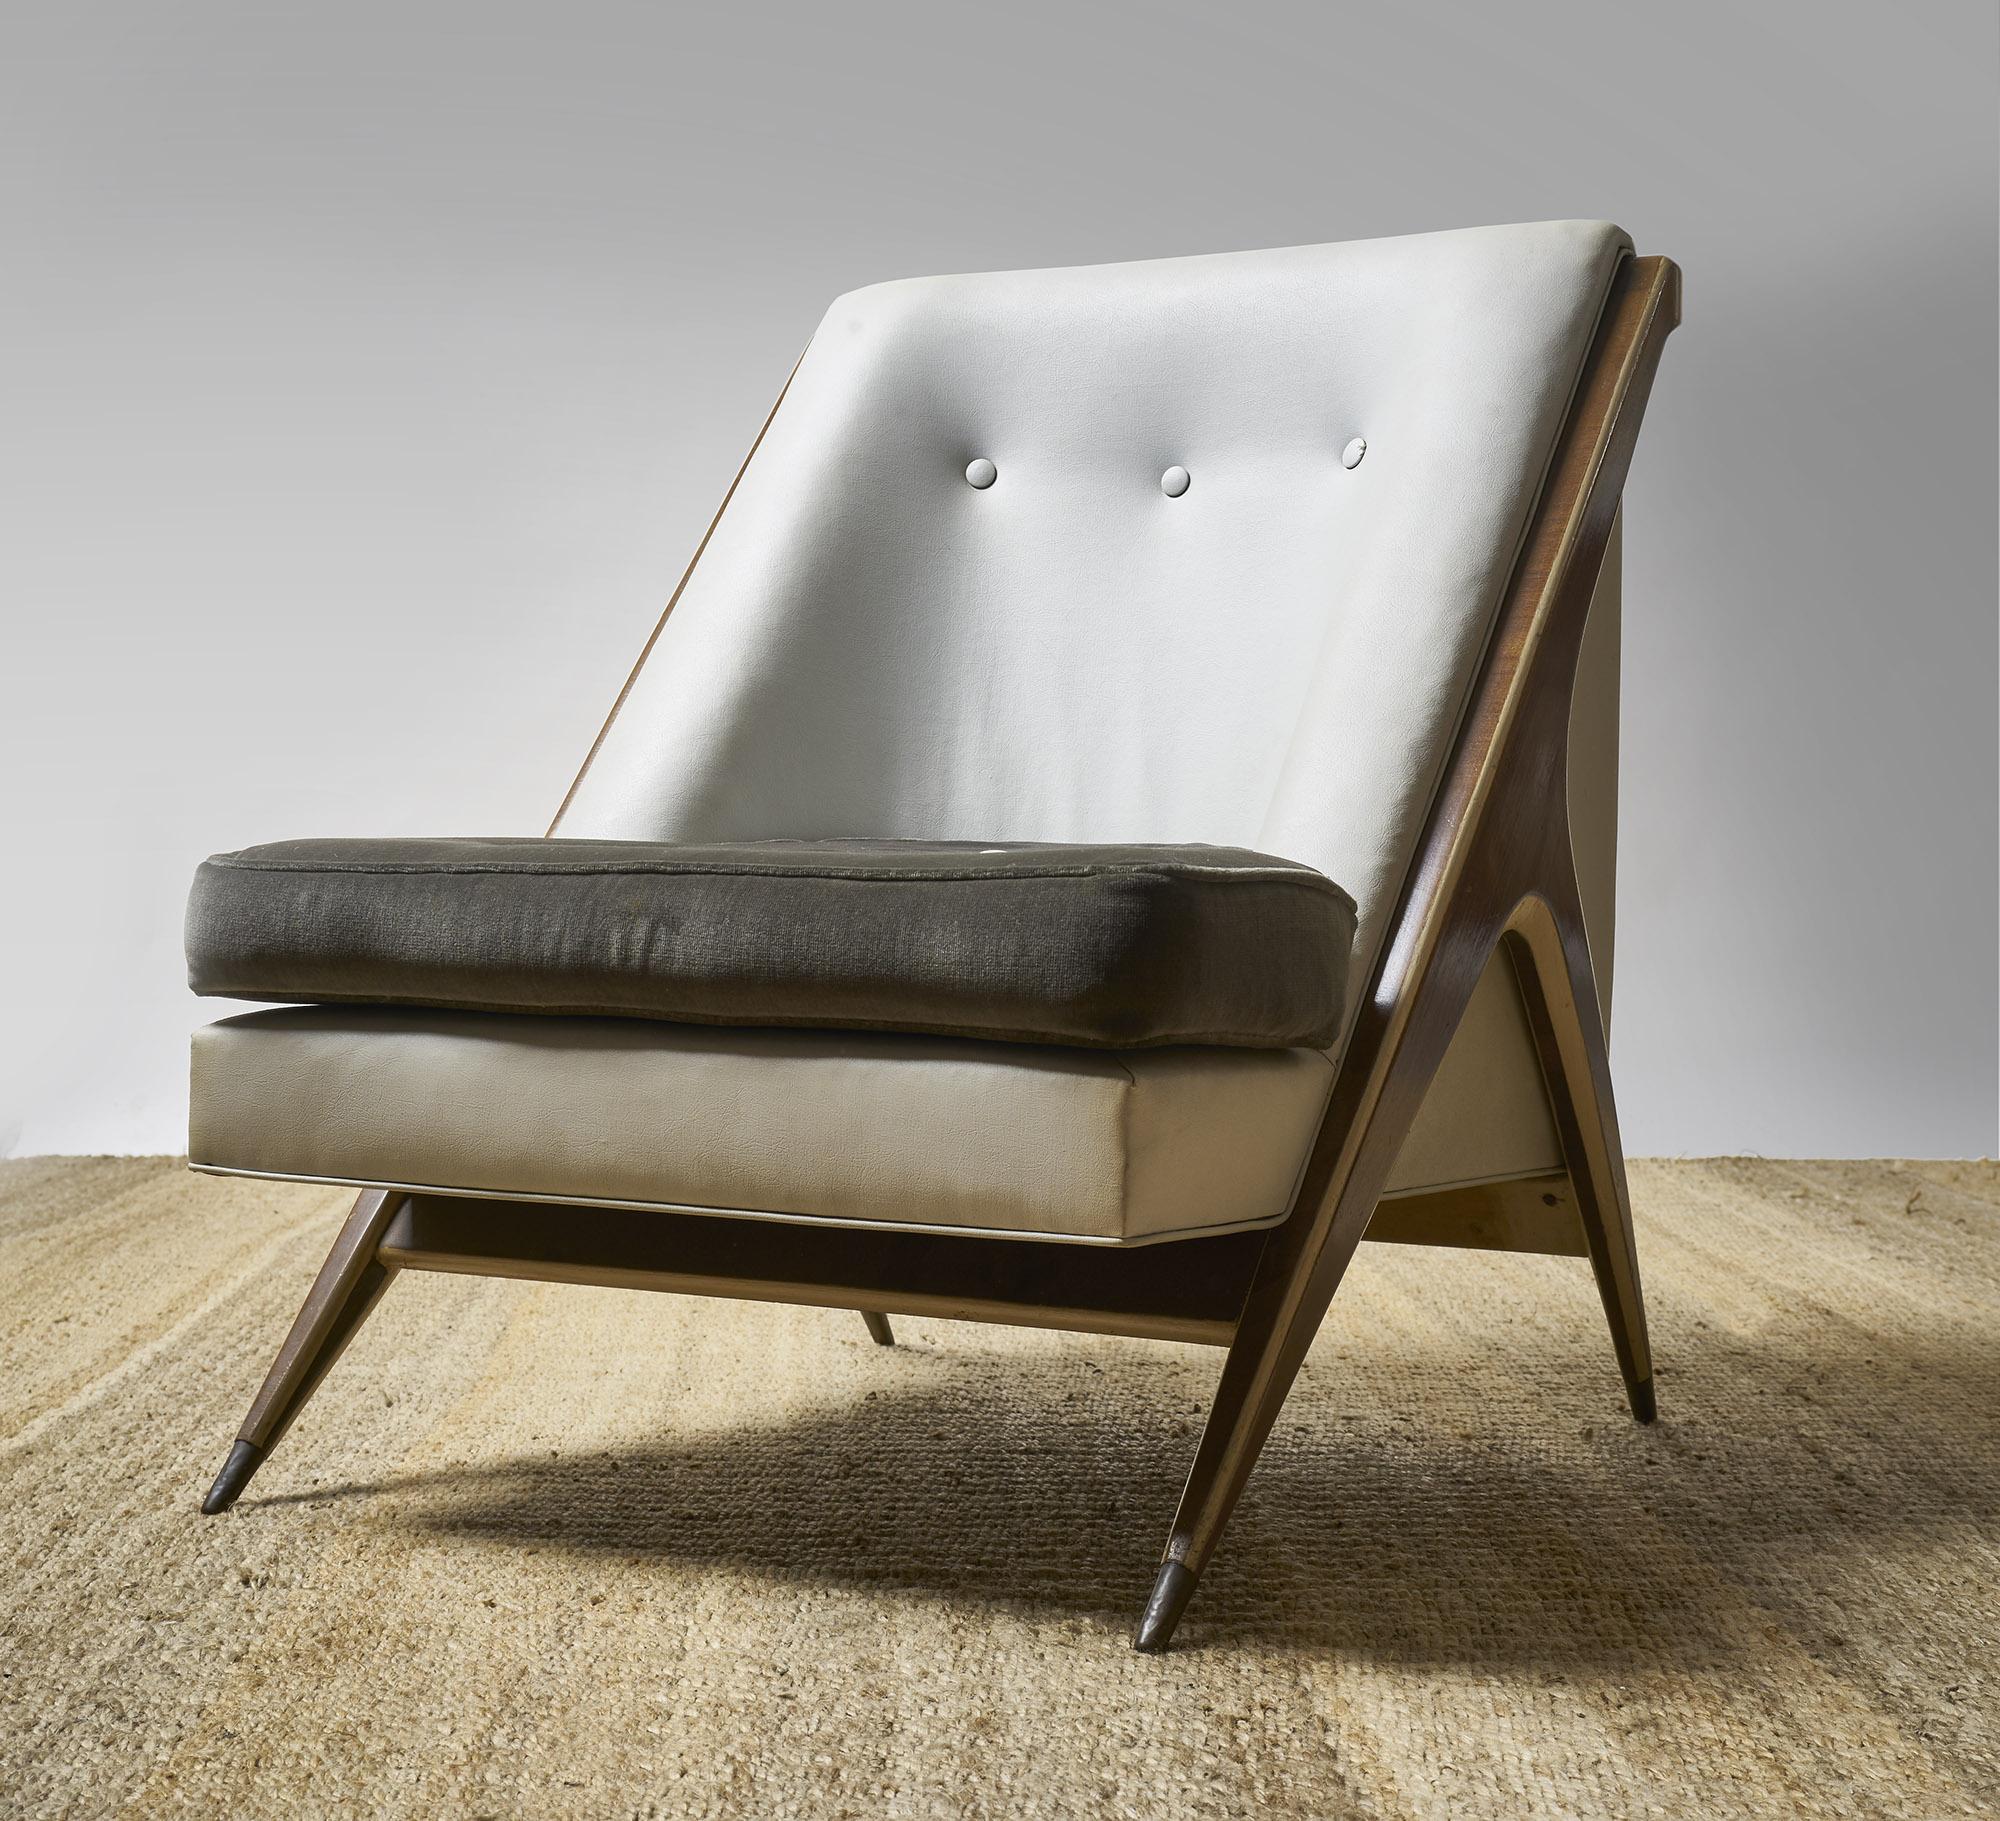 Par de sillones principios de siglo XX